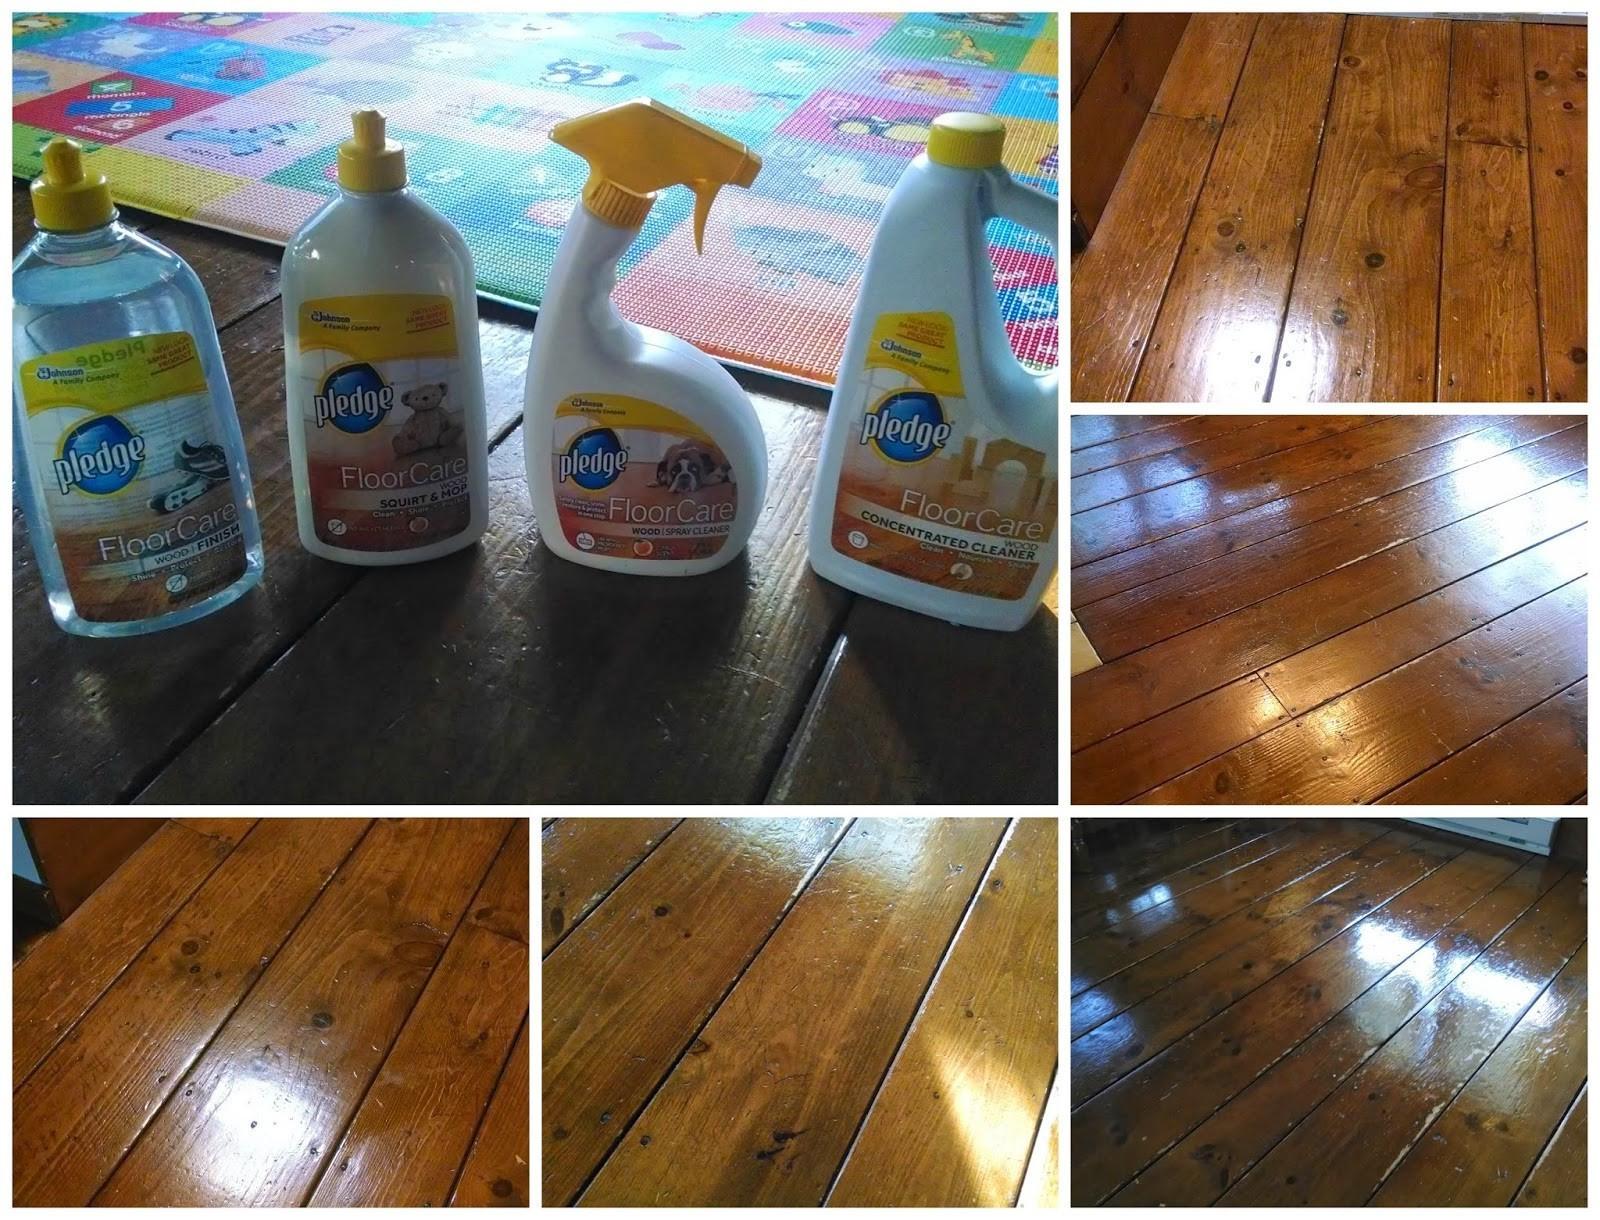 hardwood floor refinishing nashville of 17 awesome what to use to clean hardwood floors image dizpos com with regard to what to use to clean hardwood floors fresh 24 best pics best ways to clean hardwood